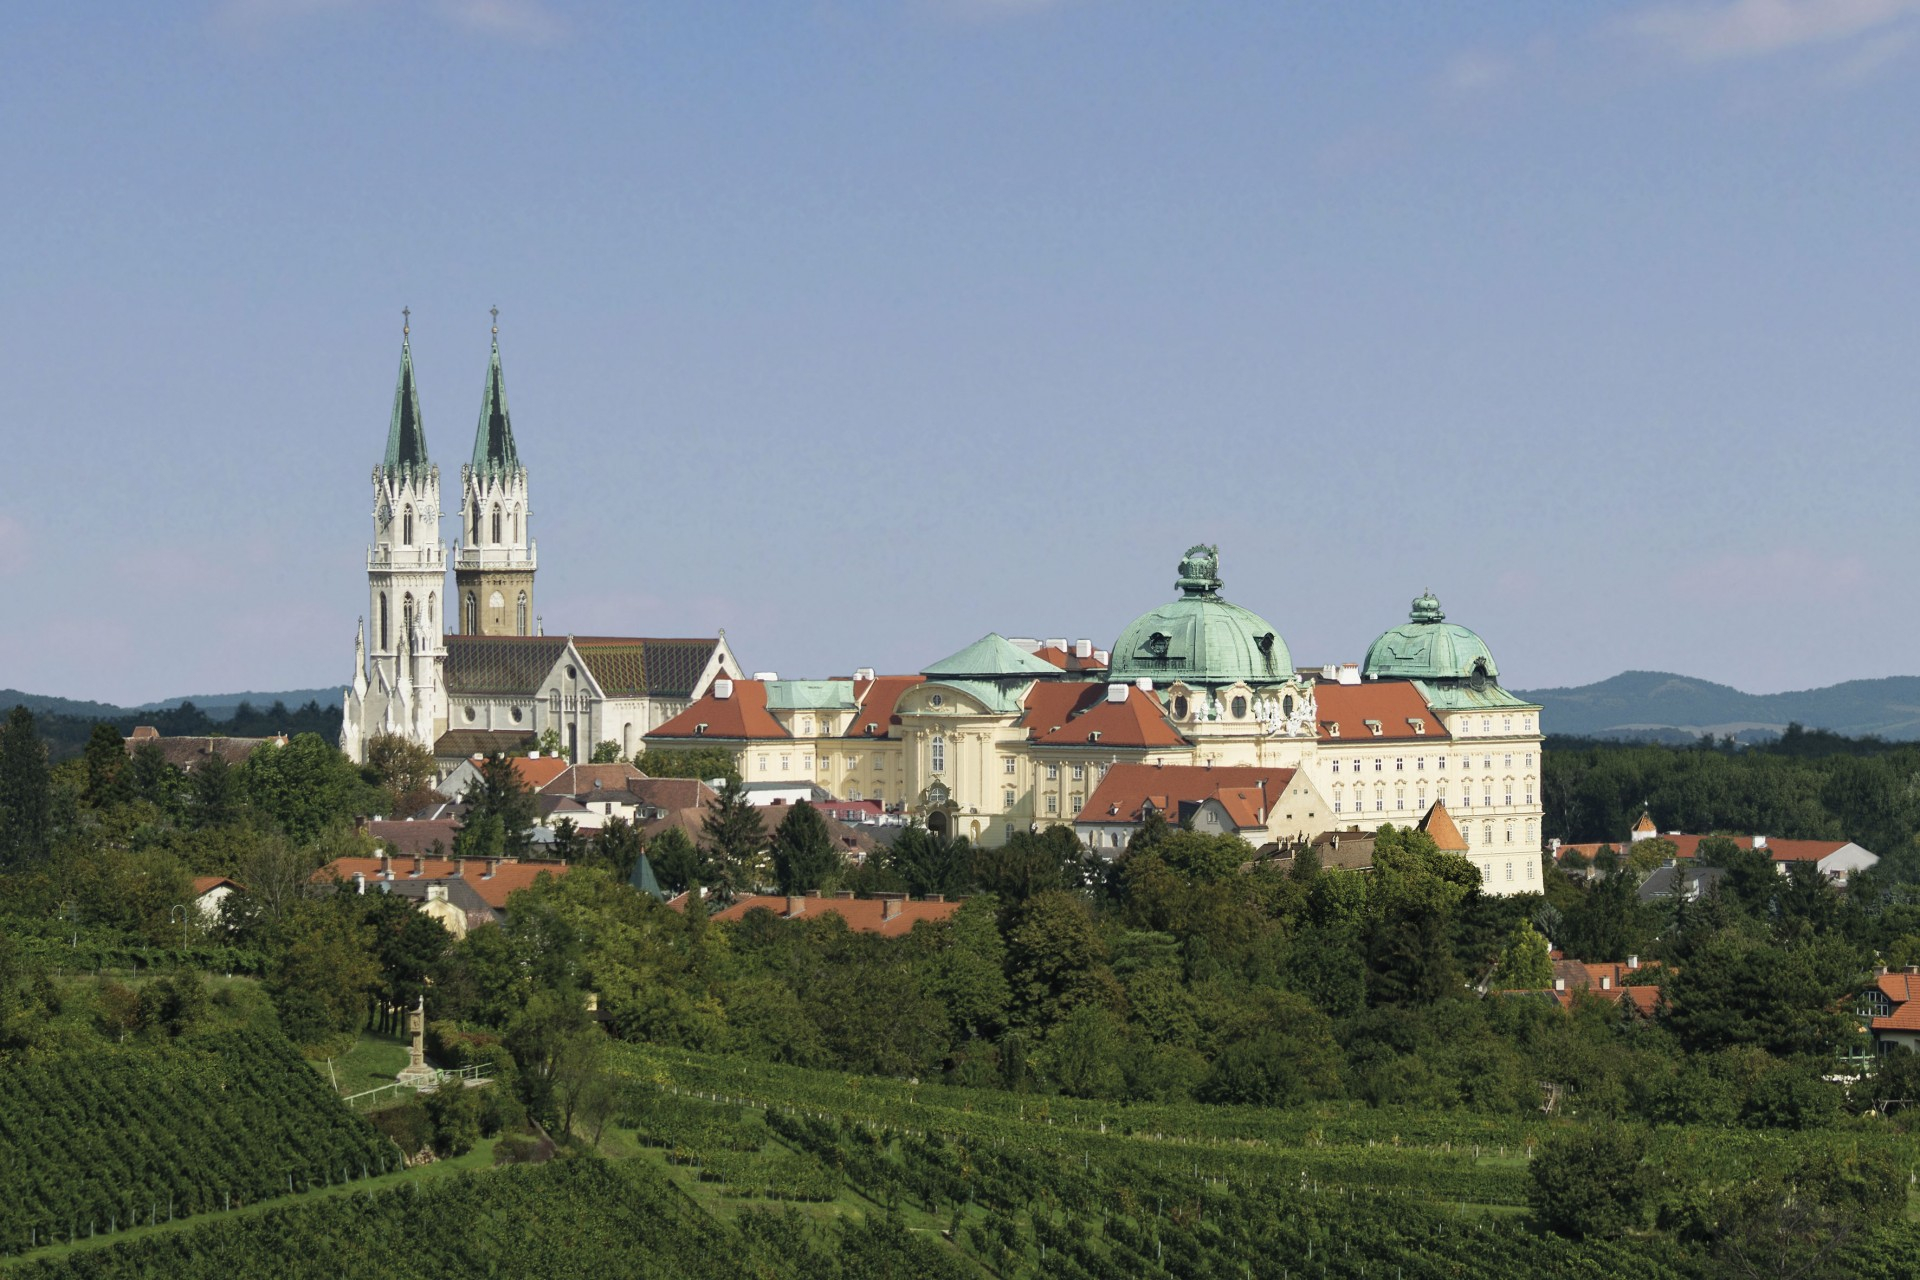 Klosterneuburg Abbey, © Michael Zechany